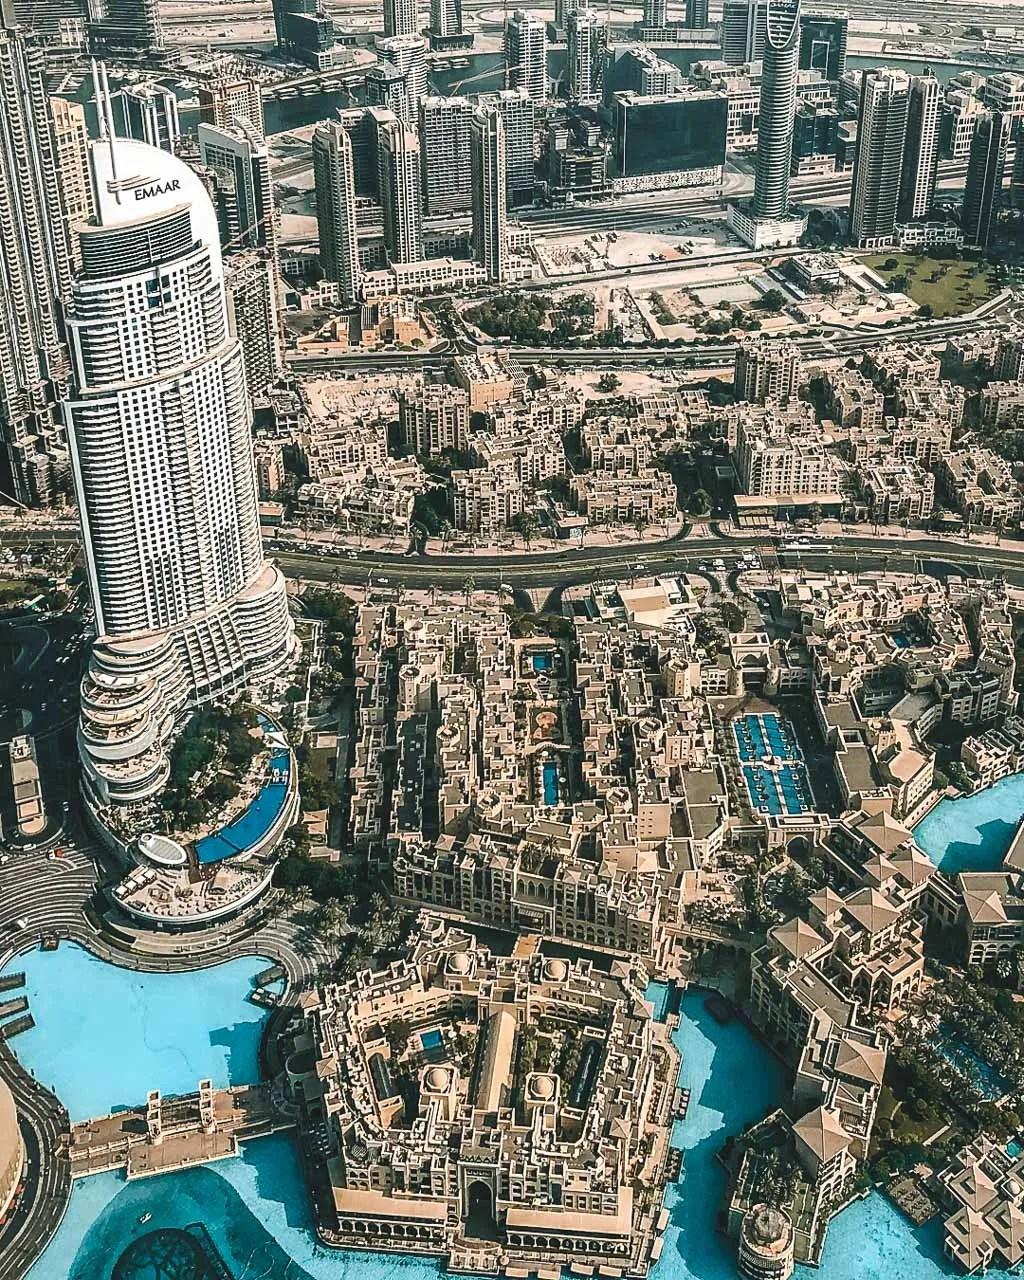 Burj al arab, Burj al Arab Dubai, highest tower in the world. Dubai itinerary, 3 days in Dubai, Dubai city trip, Dubai things to do, Dubai must do, Burj Khalifa observation deck, Burj khalifa view